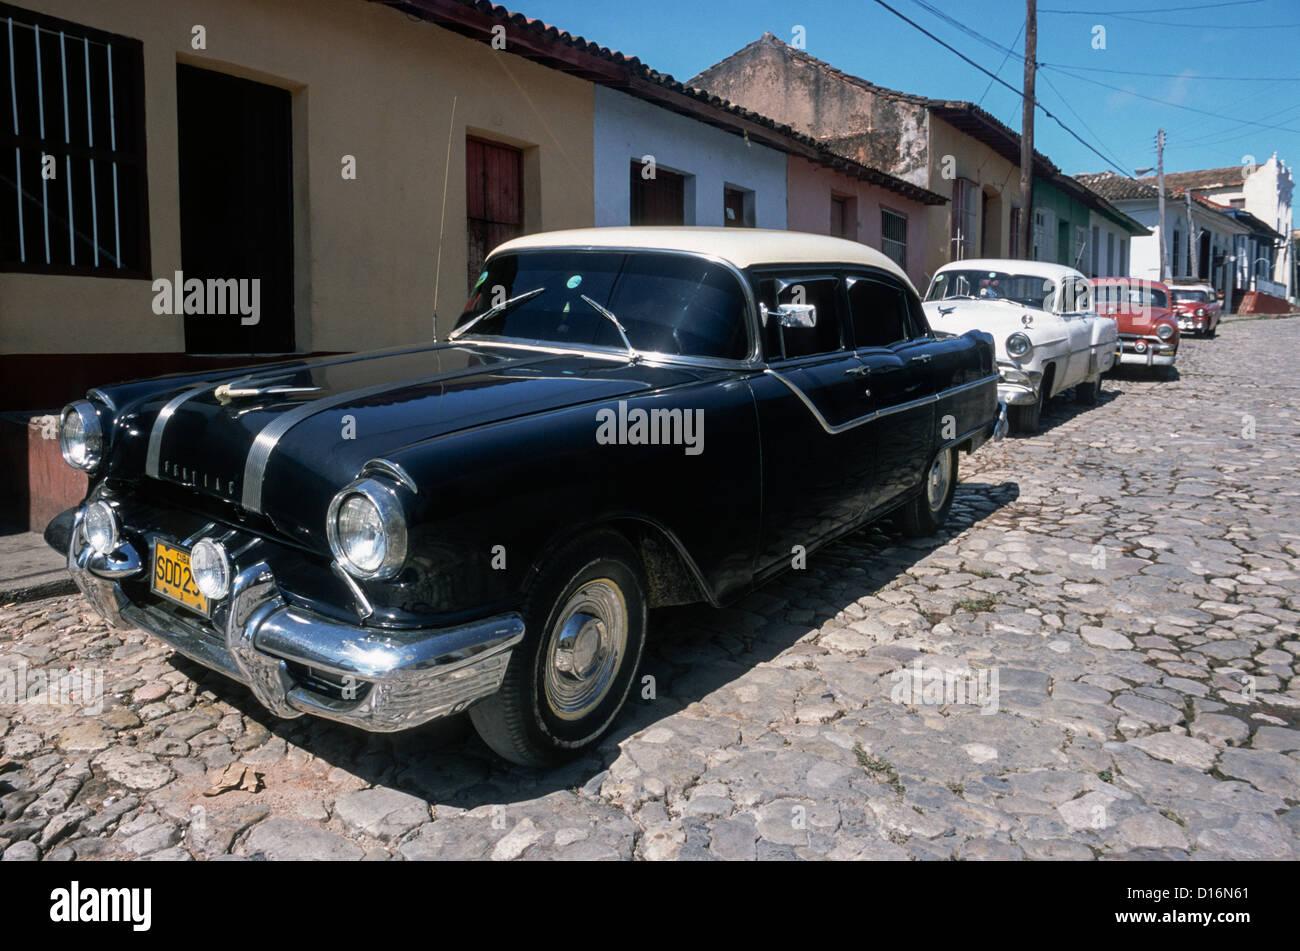 1955 pontiac star chief 4 door sedan in a street of for 1955 pontiac chieftain 4 door